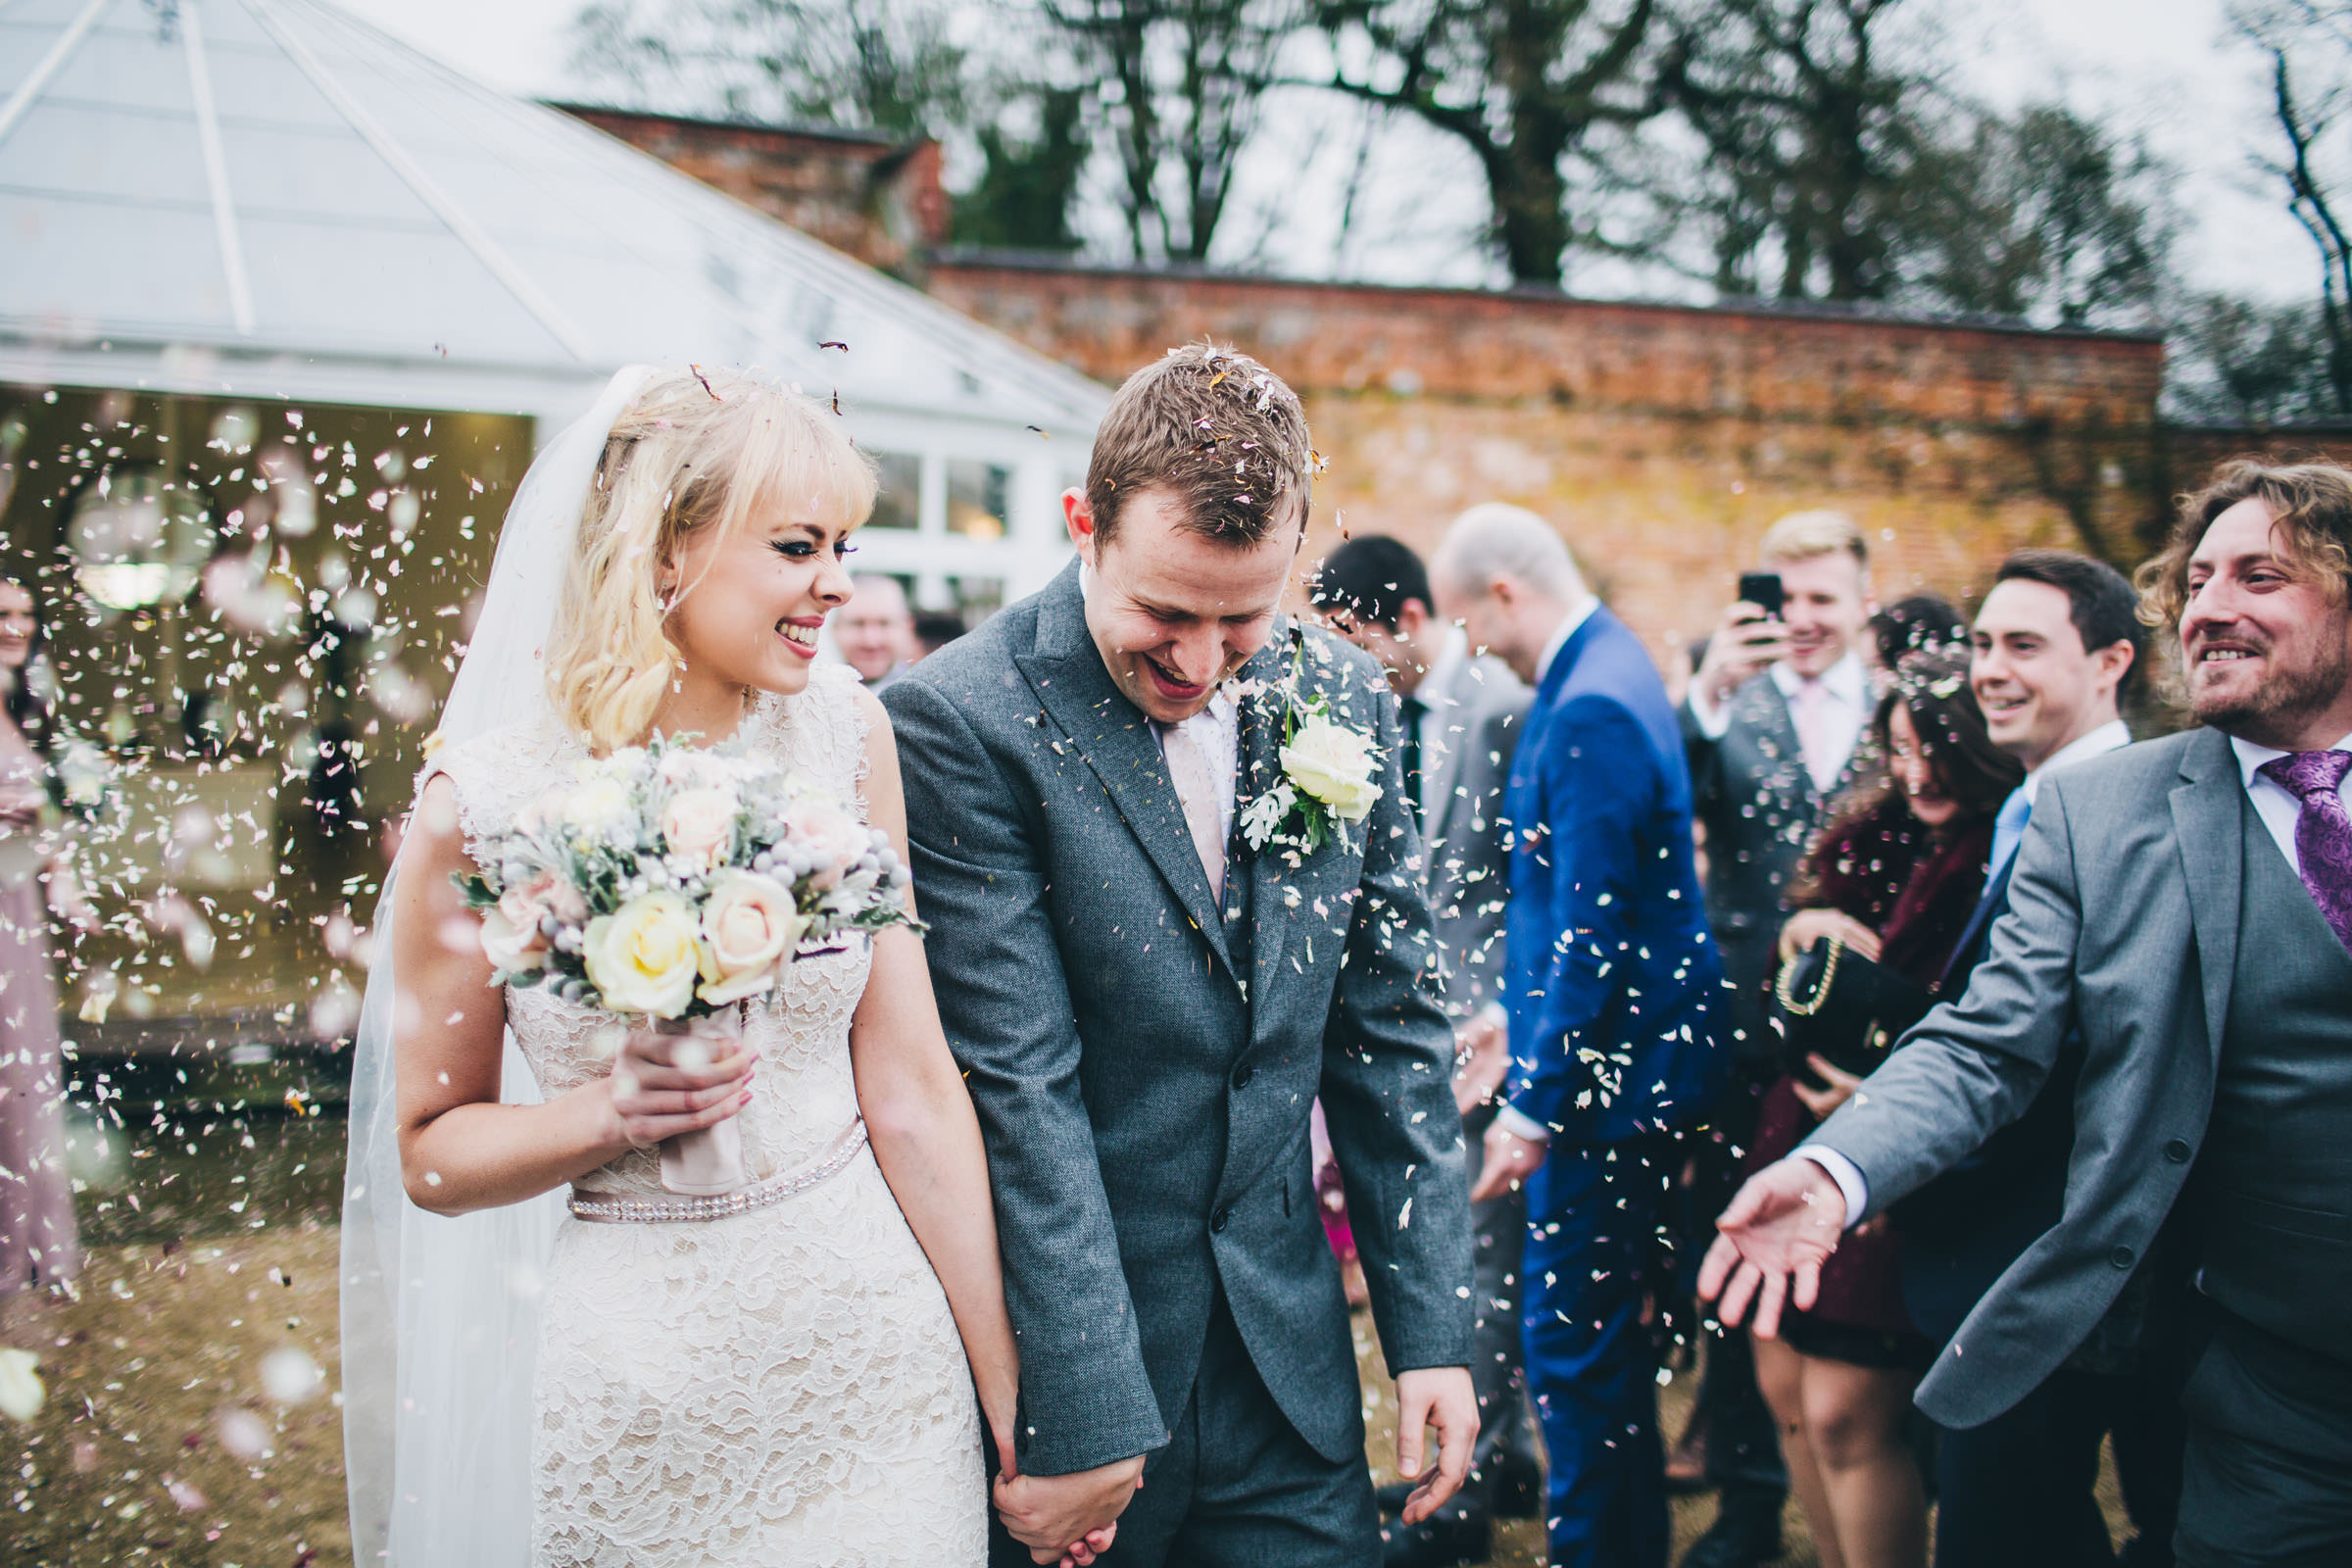 Confetti - winter wedding at Combermere Abbey